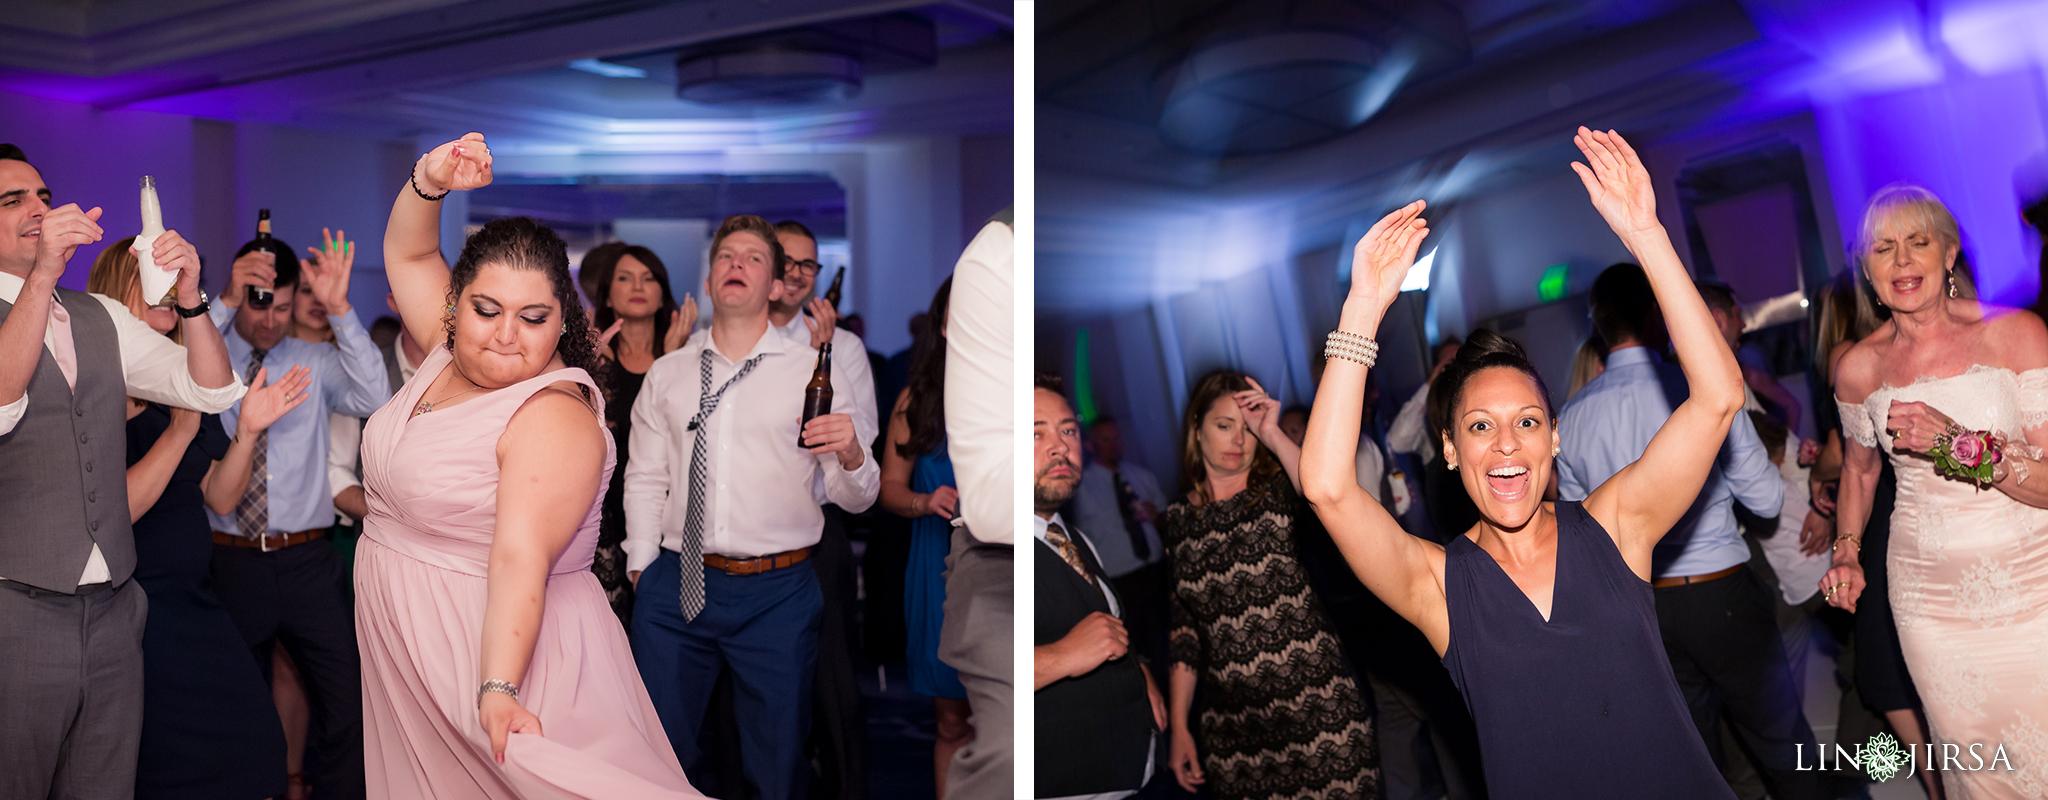 37-newport-beach-marriott-wedding-photography